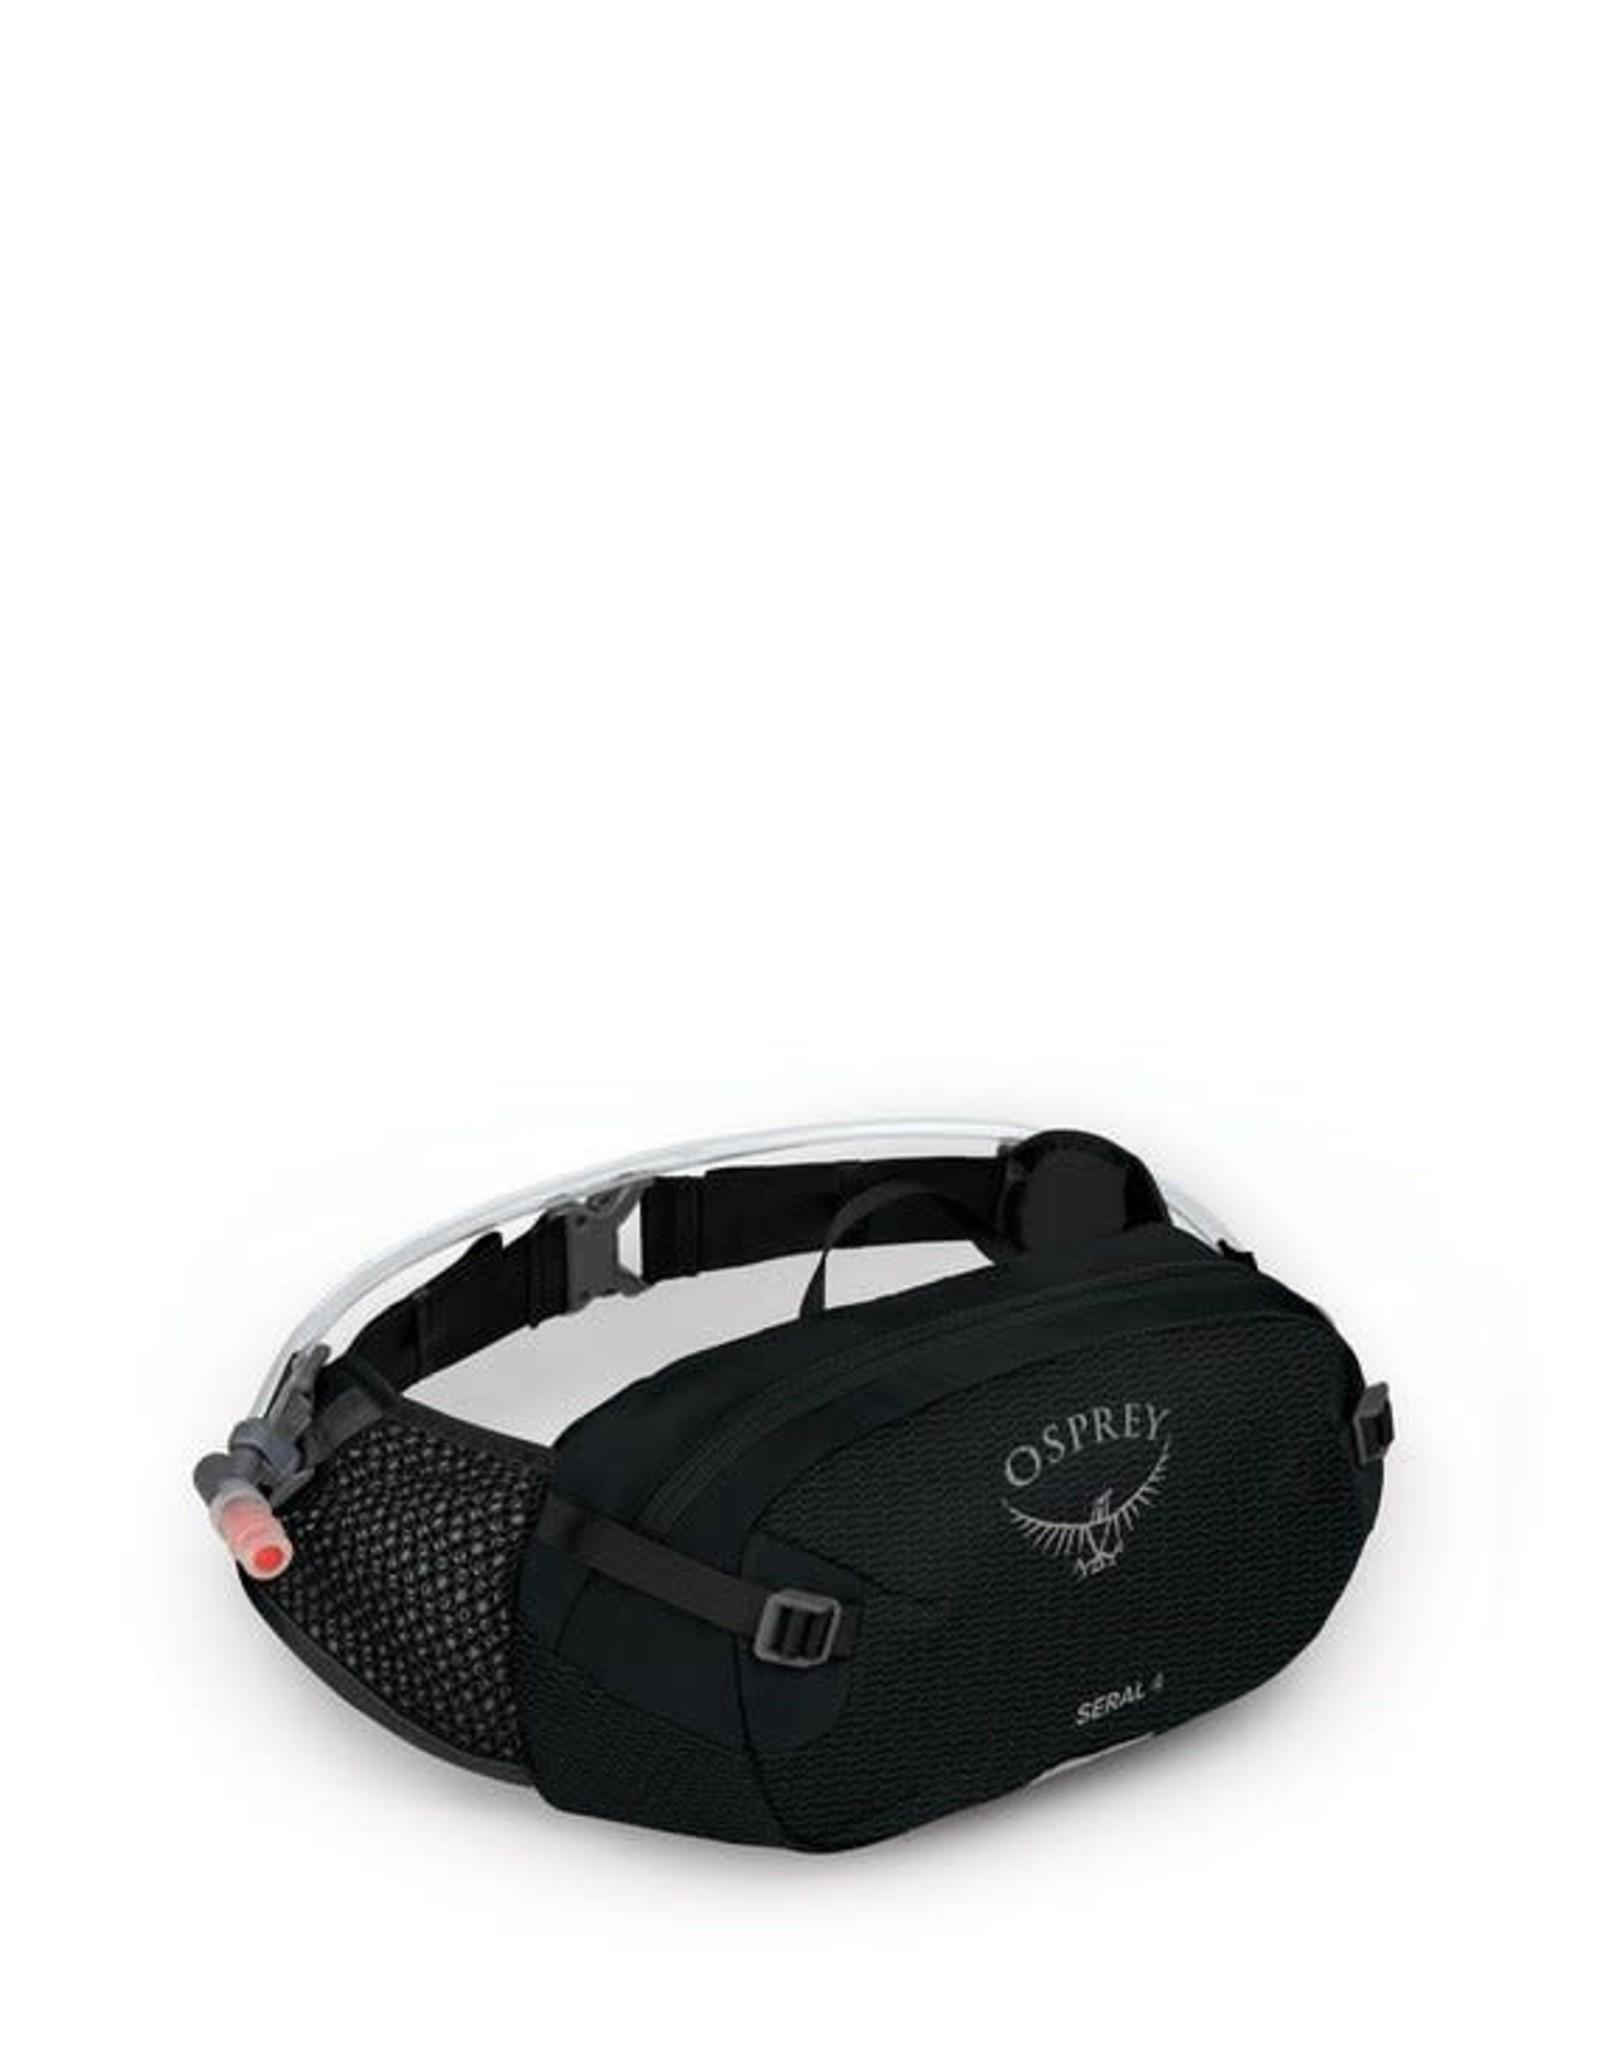 Osprey Osprey Seral 4 Lumbar Pack